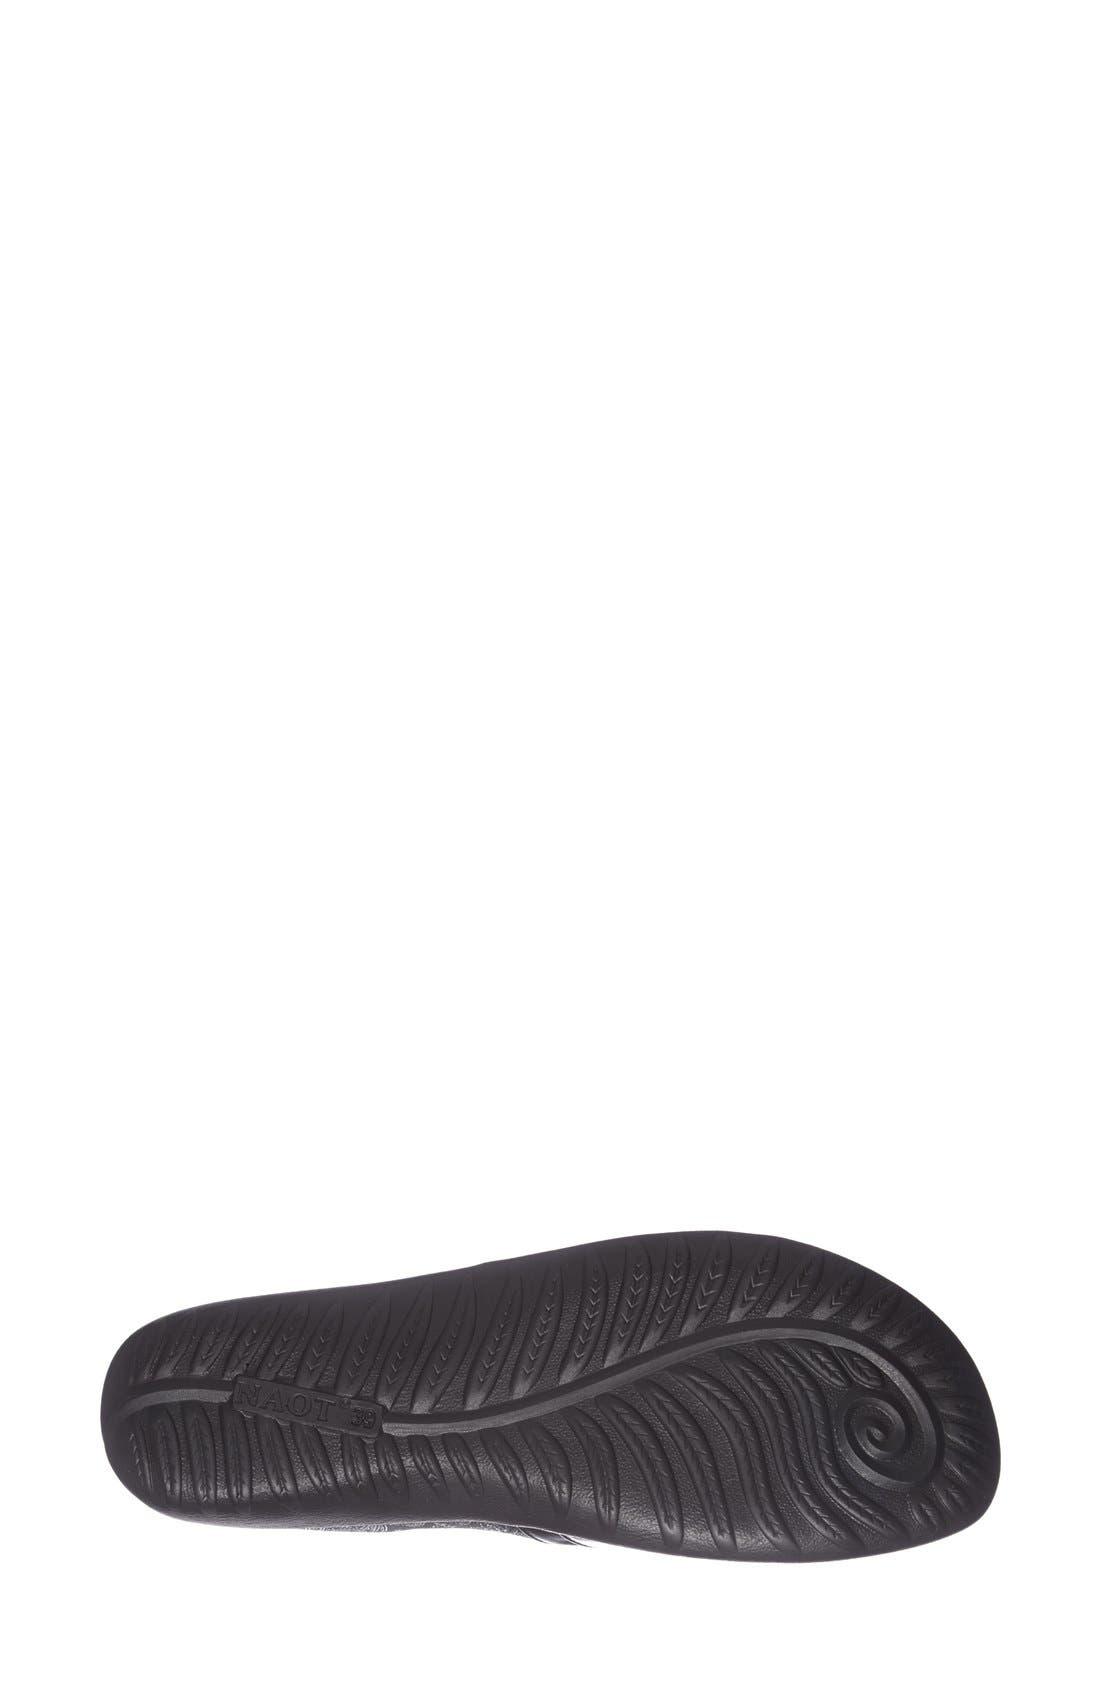 'Miro' Loafer,                             Alternate thumbnail 4, color,                             Black Lace